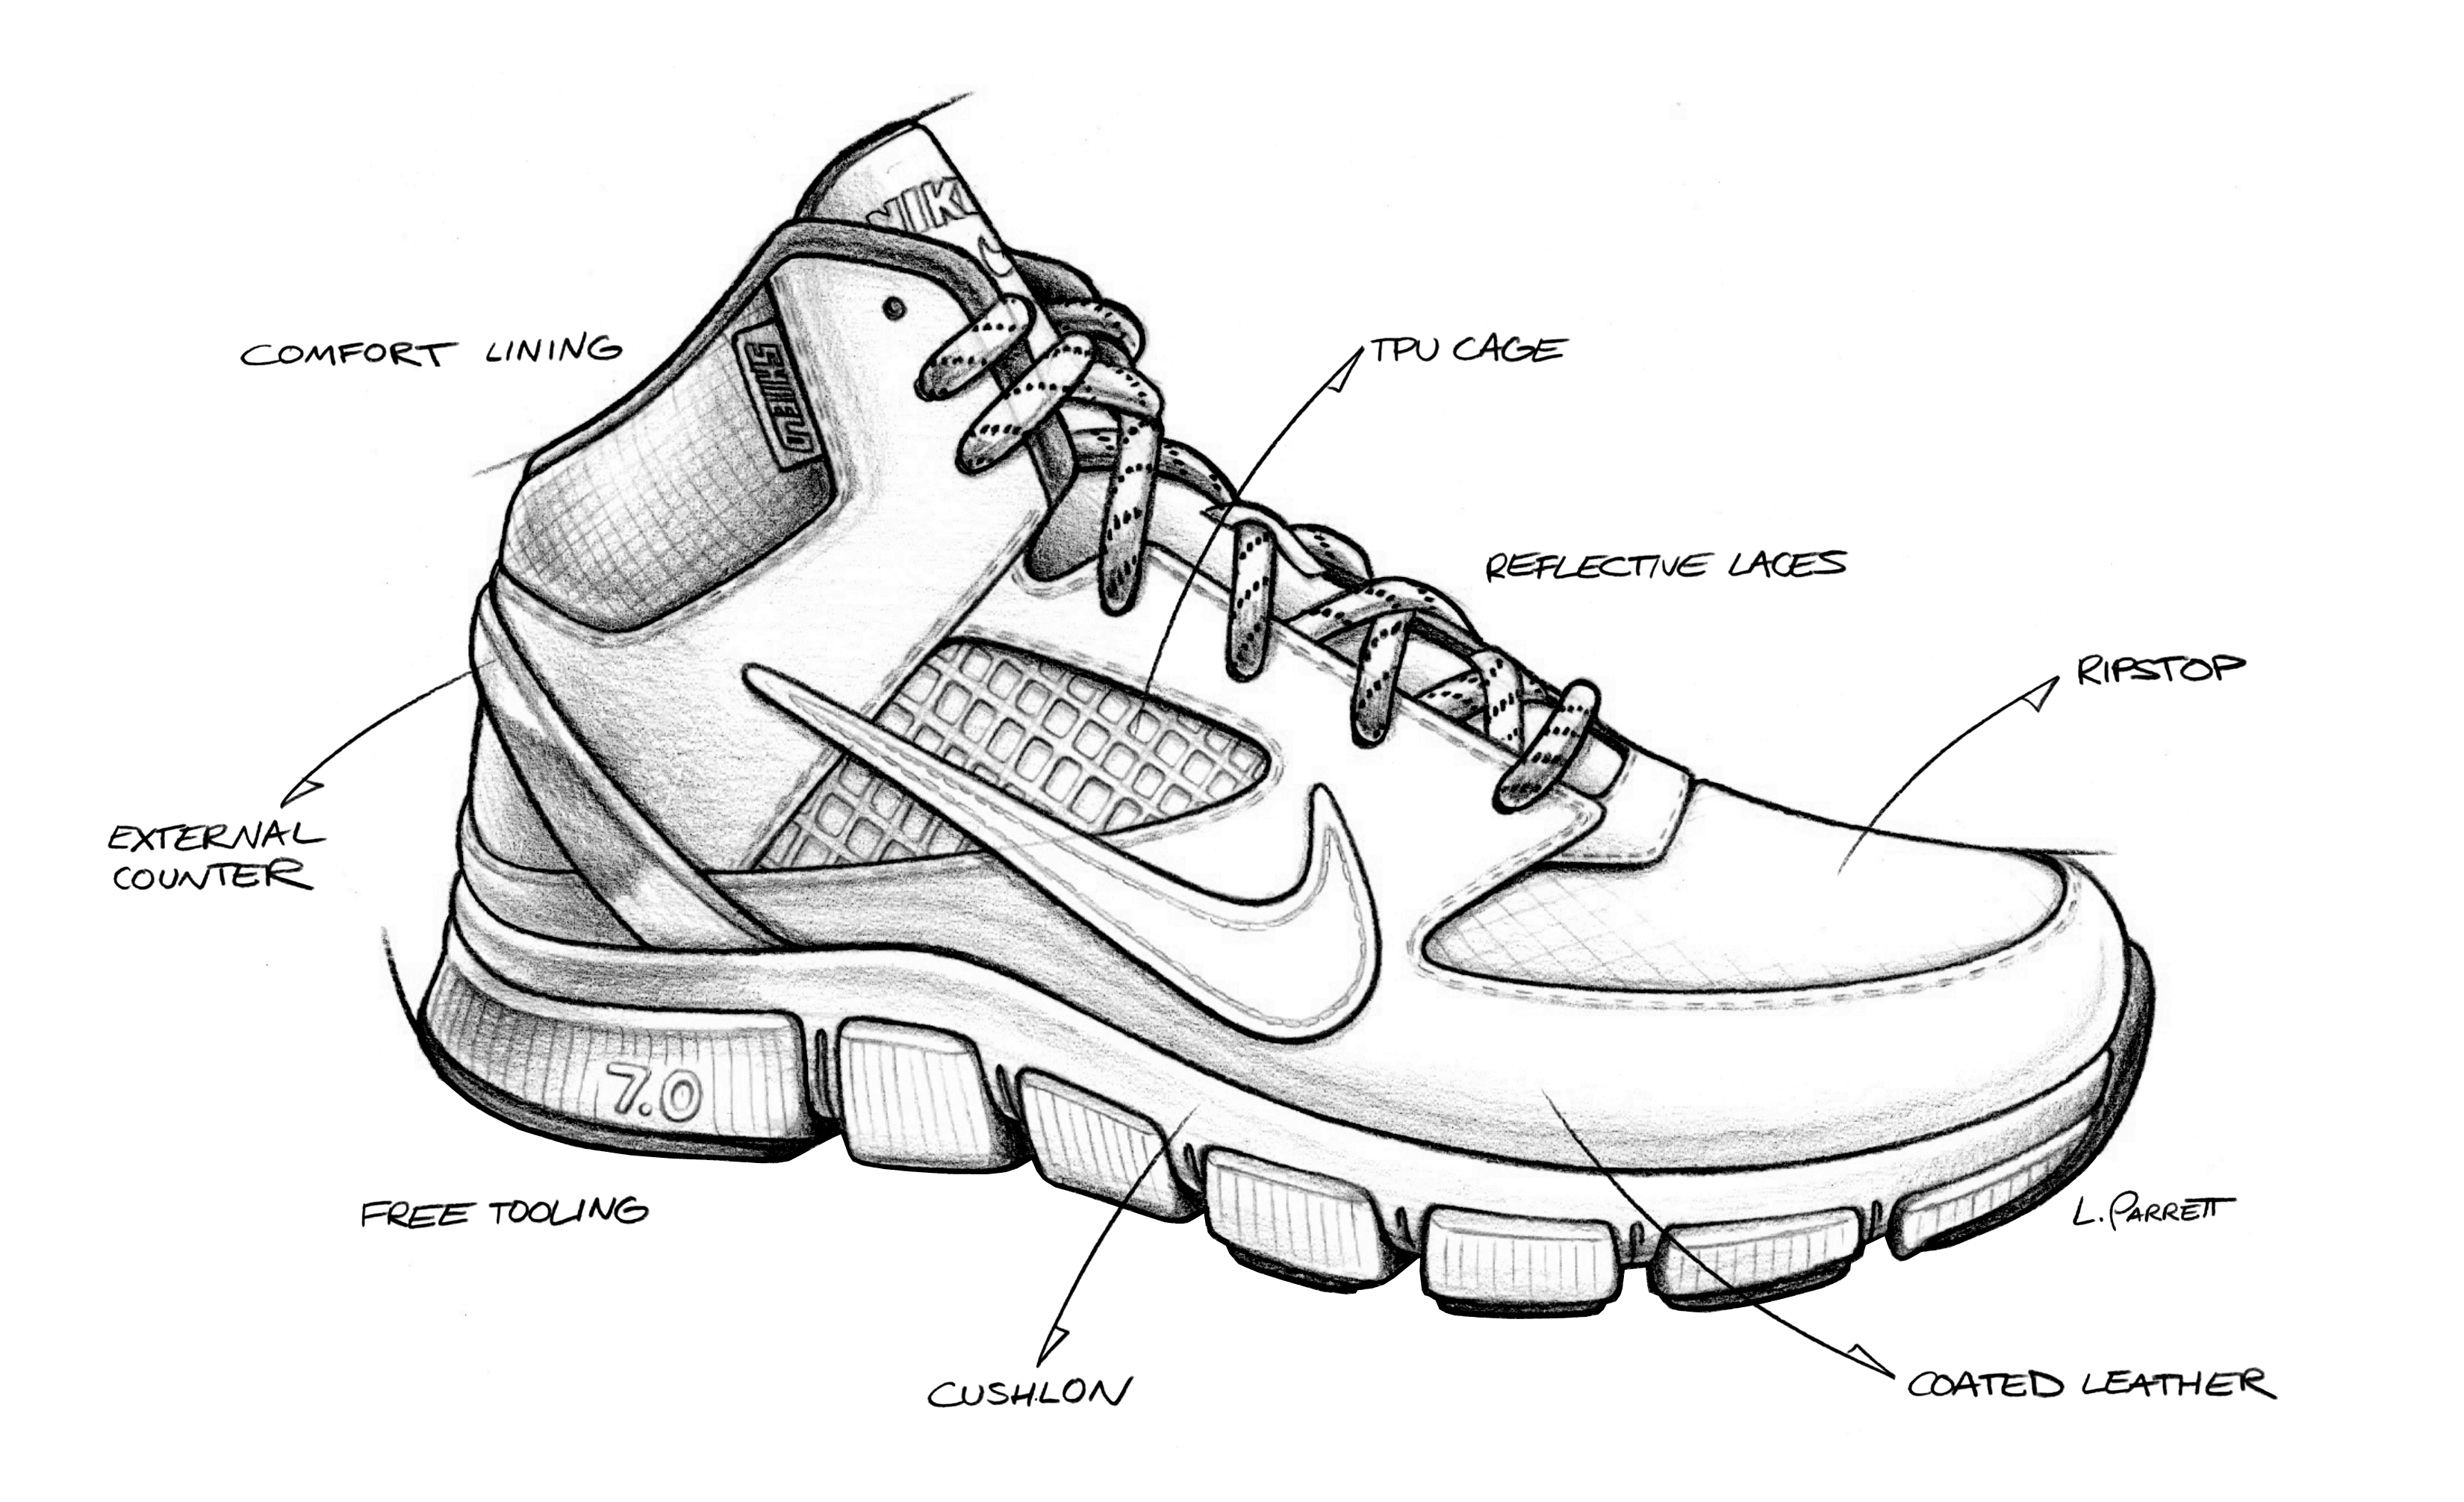 Drawn shoe nike trainer #2